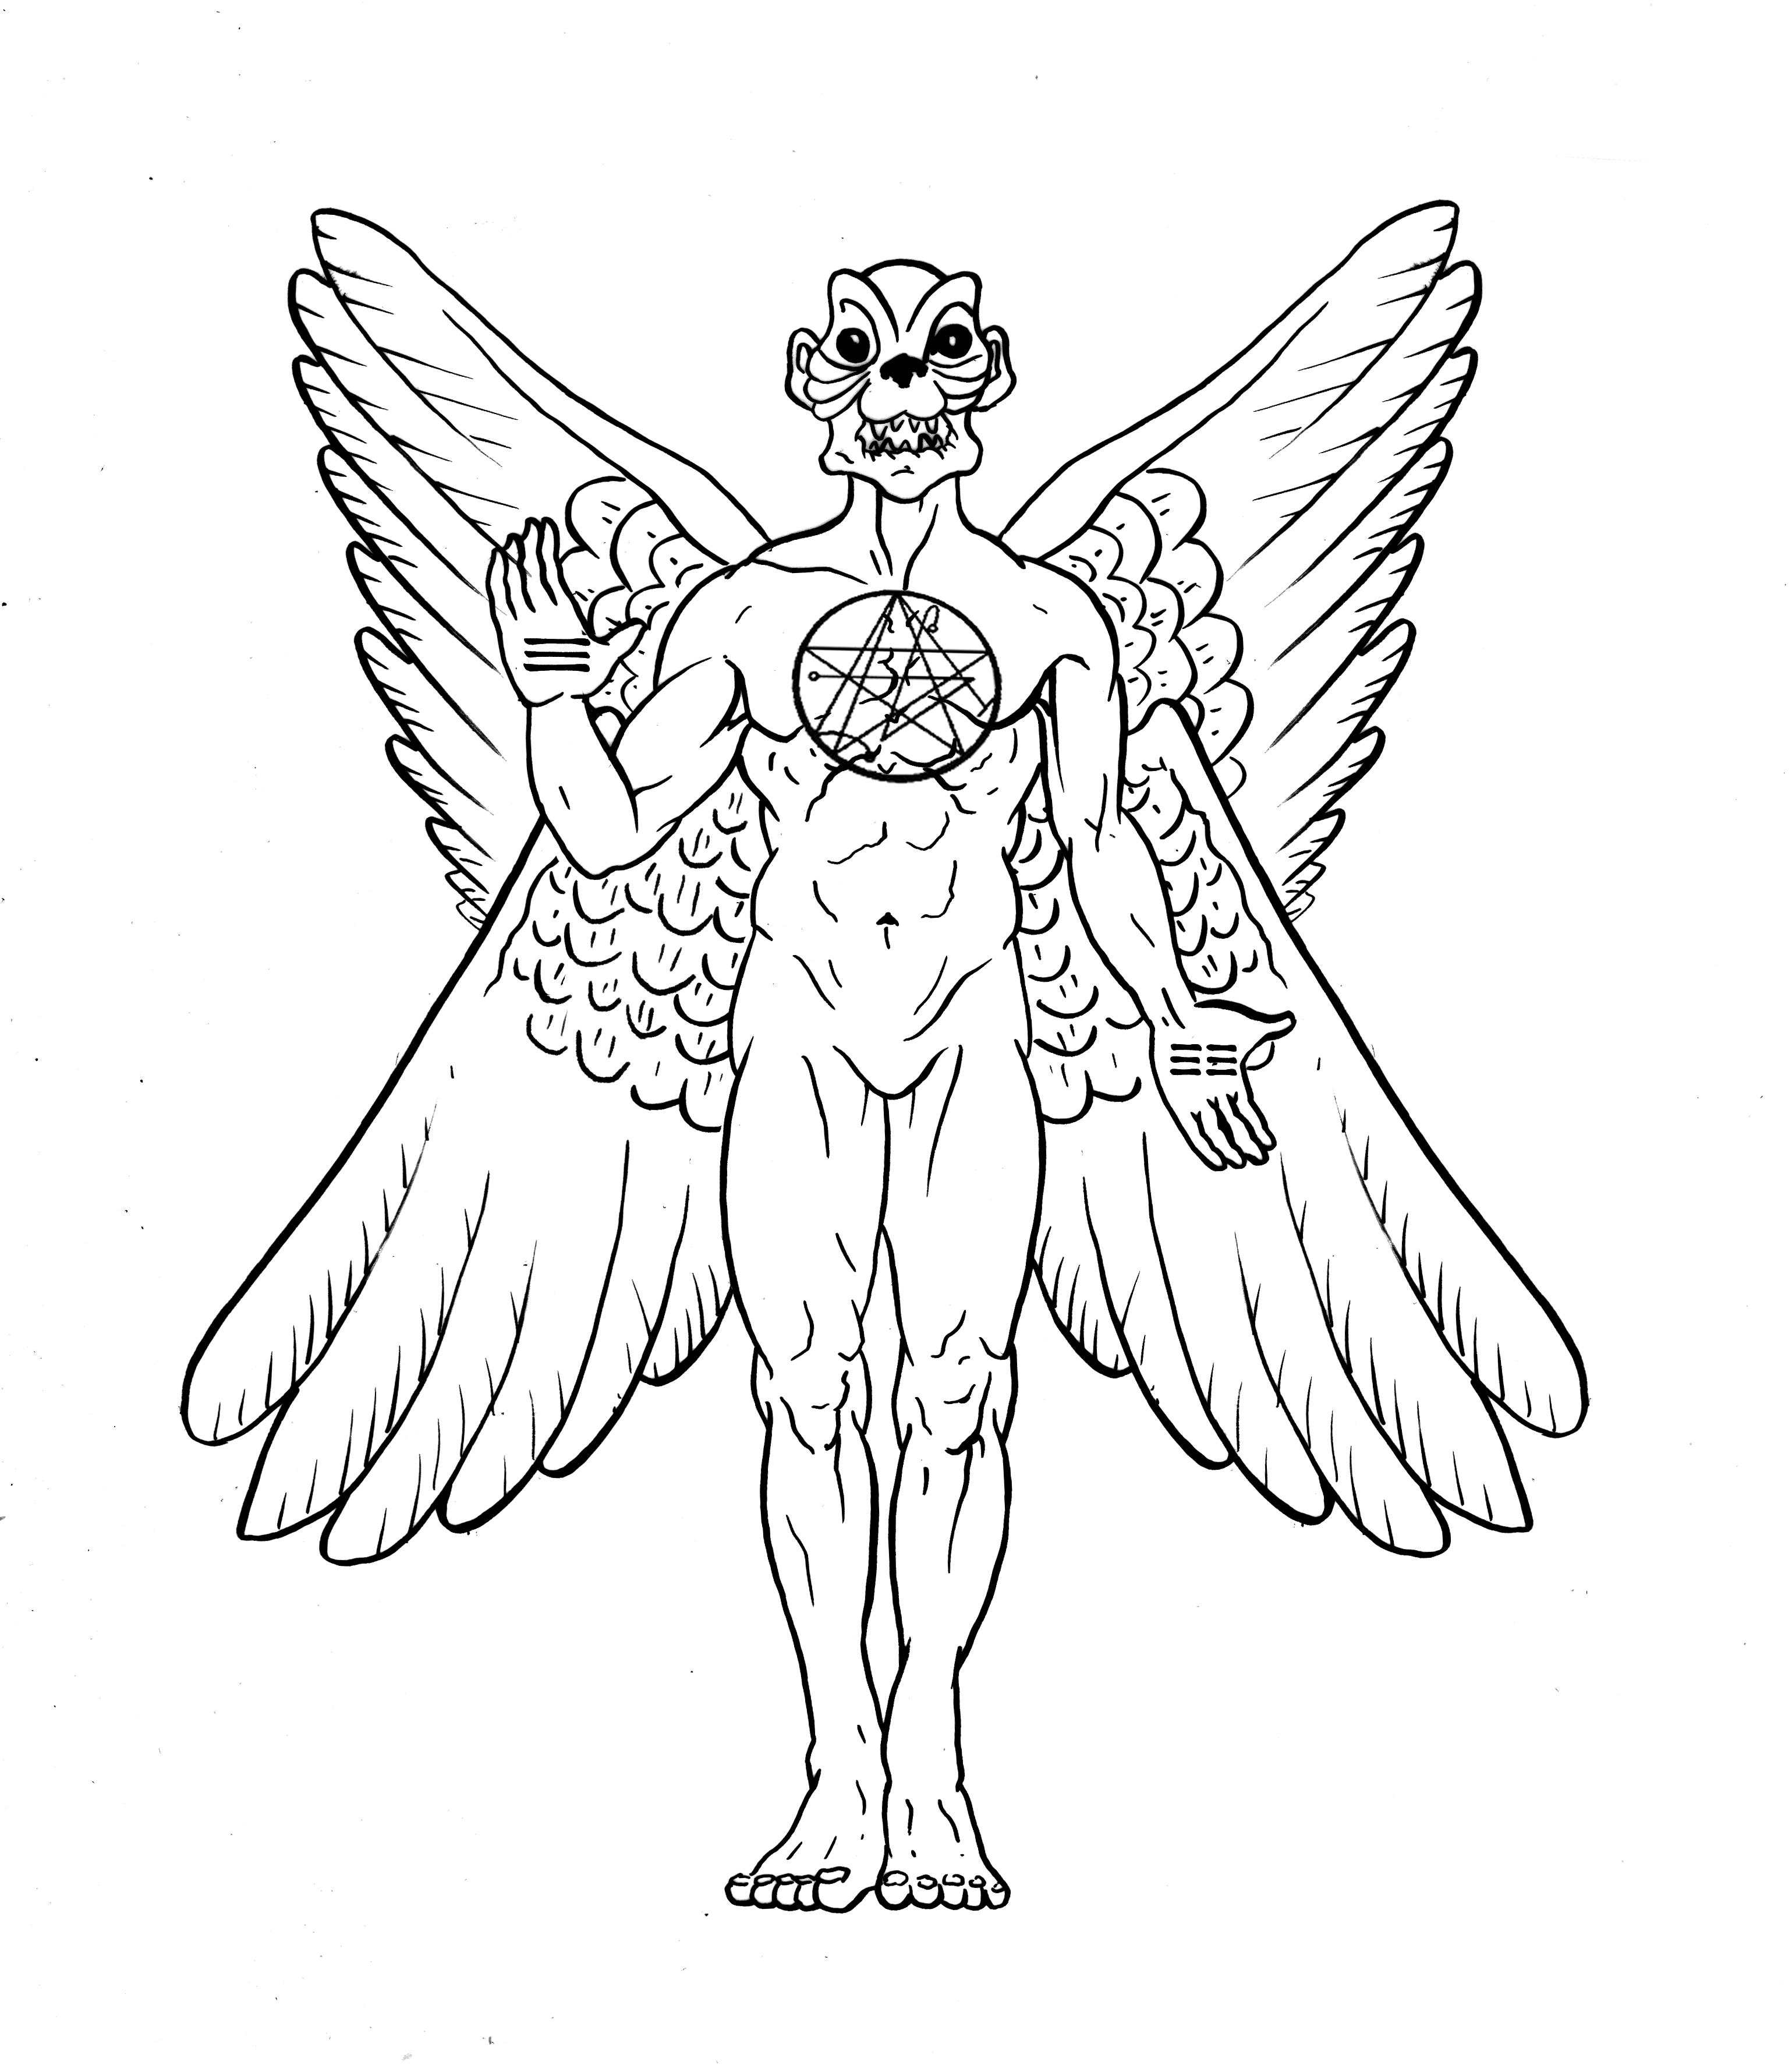 Pazuzu, the shadowside of Ninazu-The original practioner of the Art of NinzuwuThe Race of the Anzu Bird, known in Japan as the Tengu. (Illustrated by Bartolomeo Argentino)